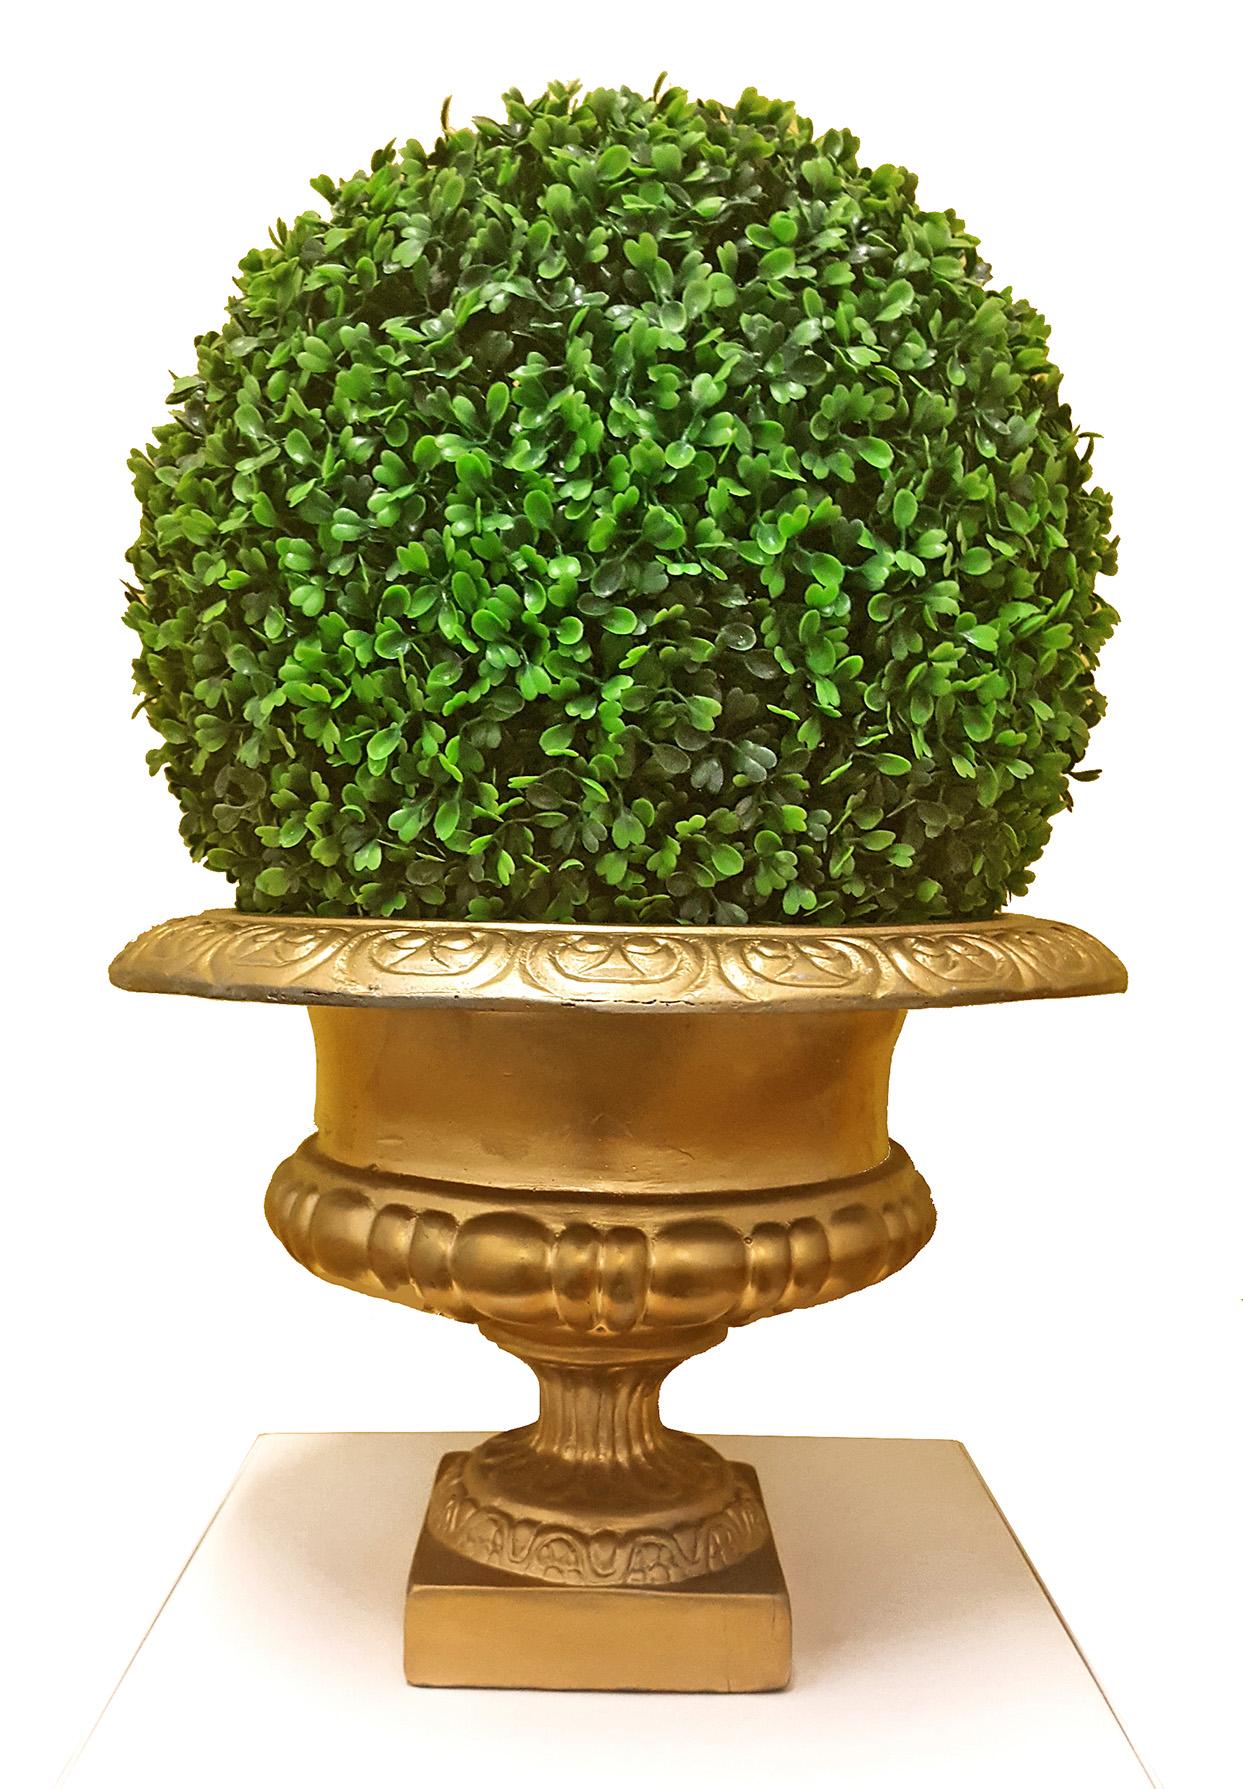 Shrub Topiary $25.00